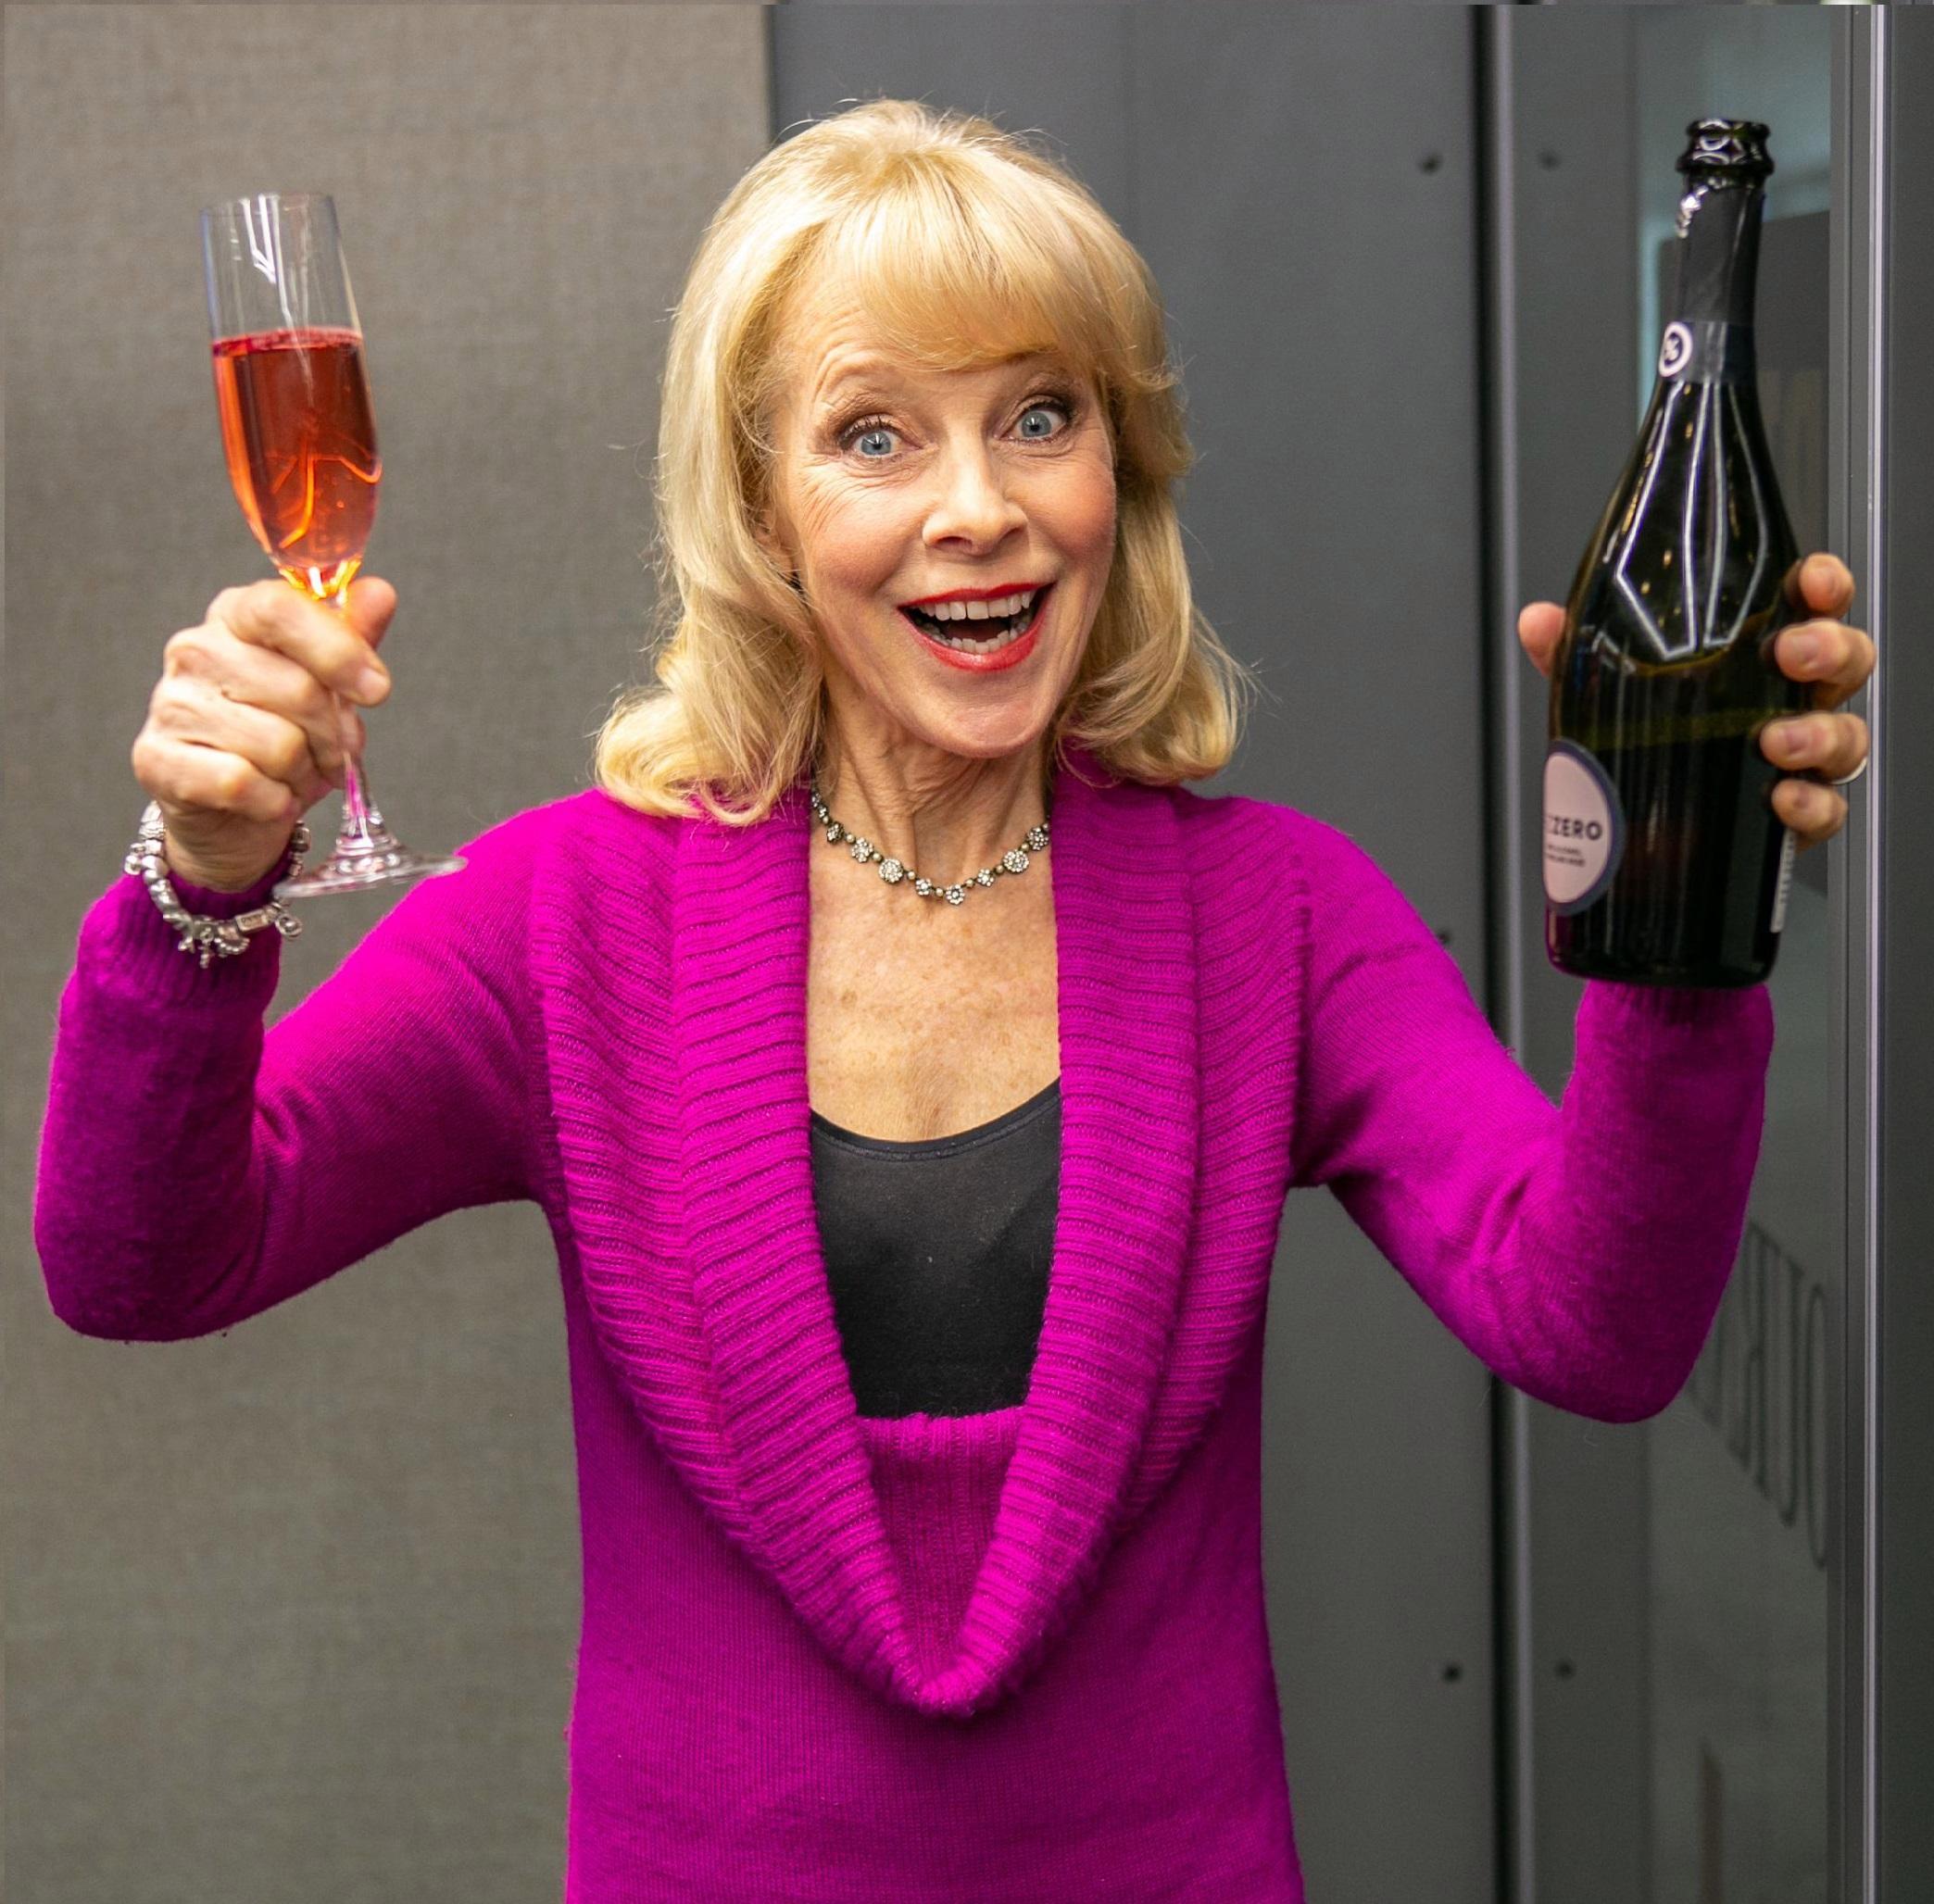 Jilly Goolden - the nation's favourite wine expert